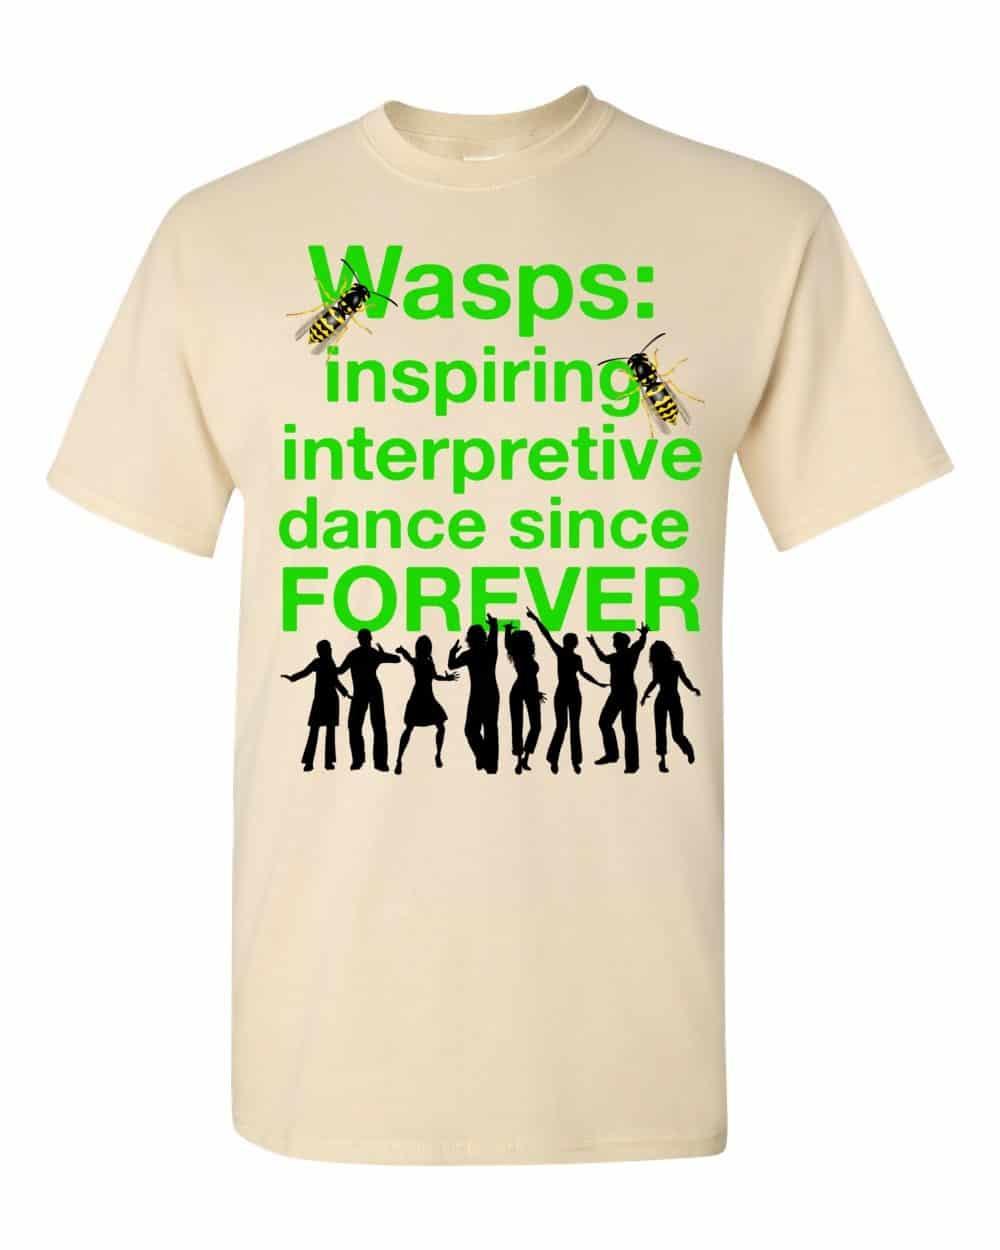 Wasps Inspire Interpretive Dance T-Shirt (natural)